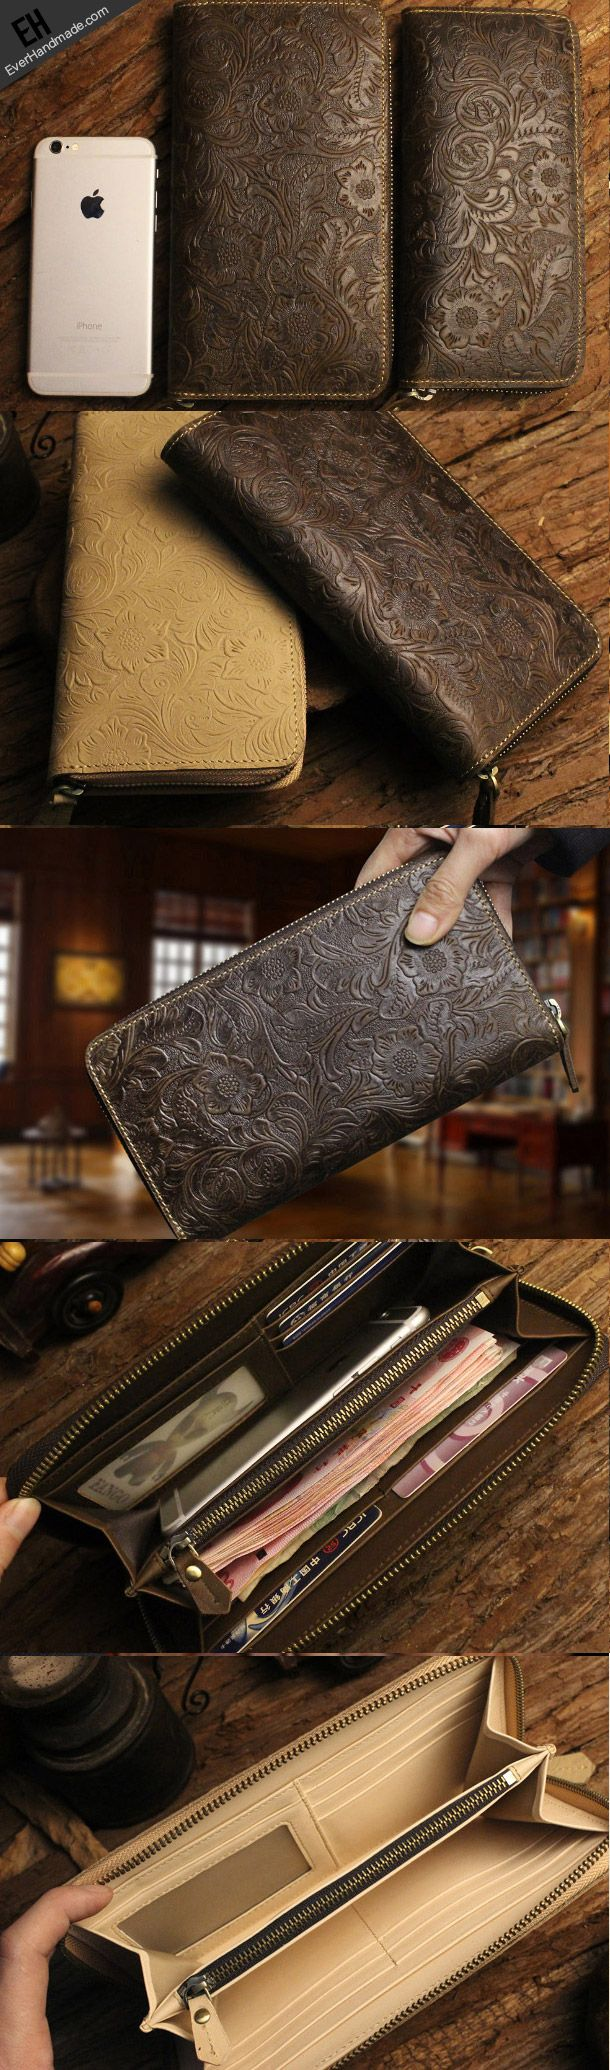 Handmade long leather wallet floral leather clutch wallet for women men